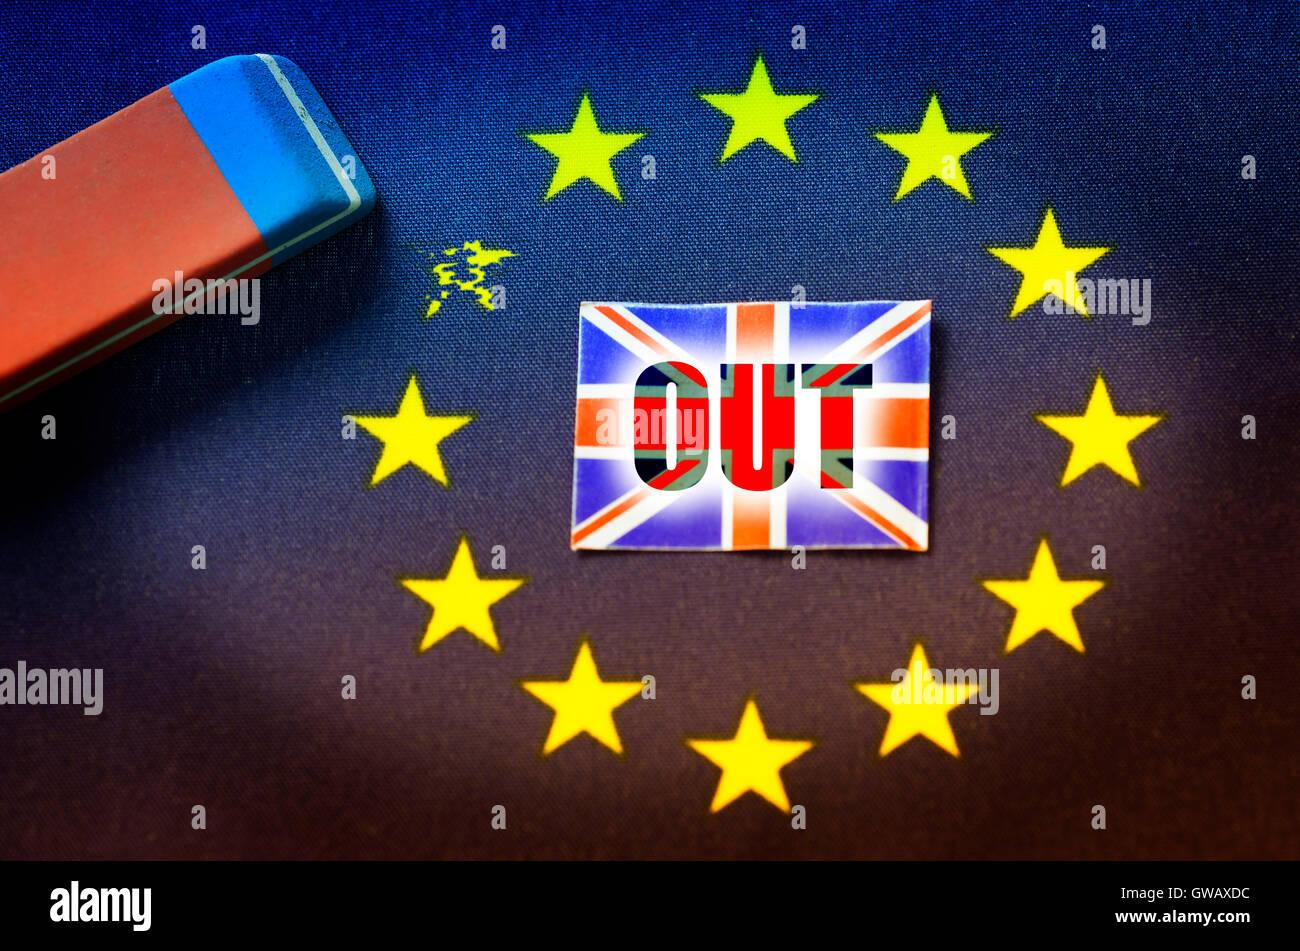 From EU flag star is erased out, symbolic photo Brexit, Aus EU-Fahne wird Stern ausradiert, Symbolfoto Brexit Stock Photo